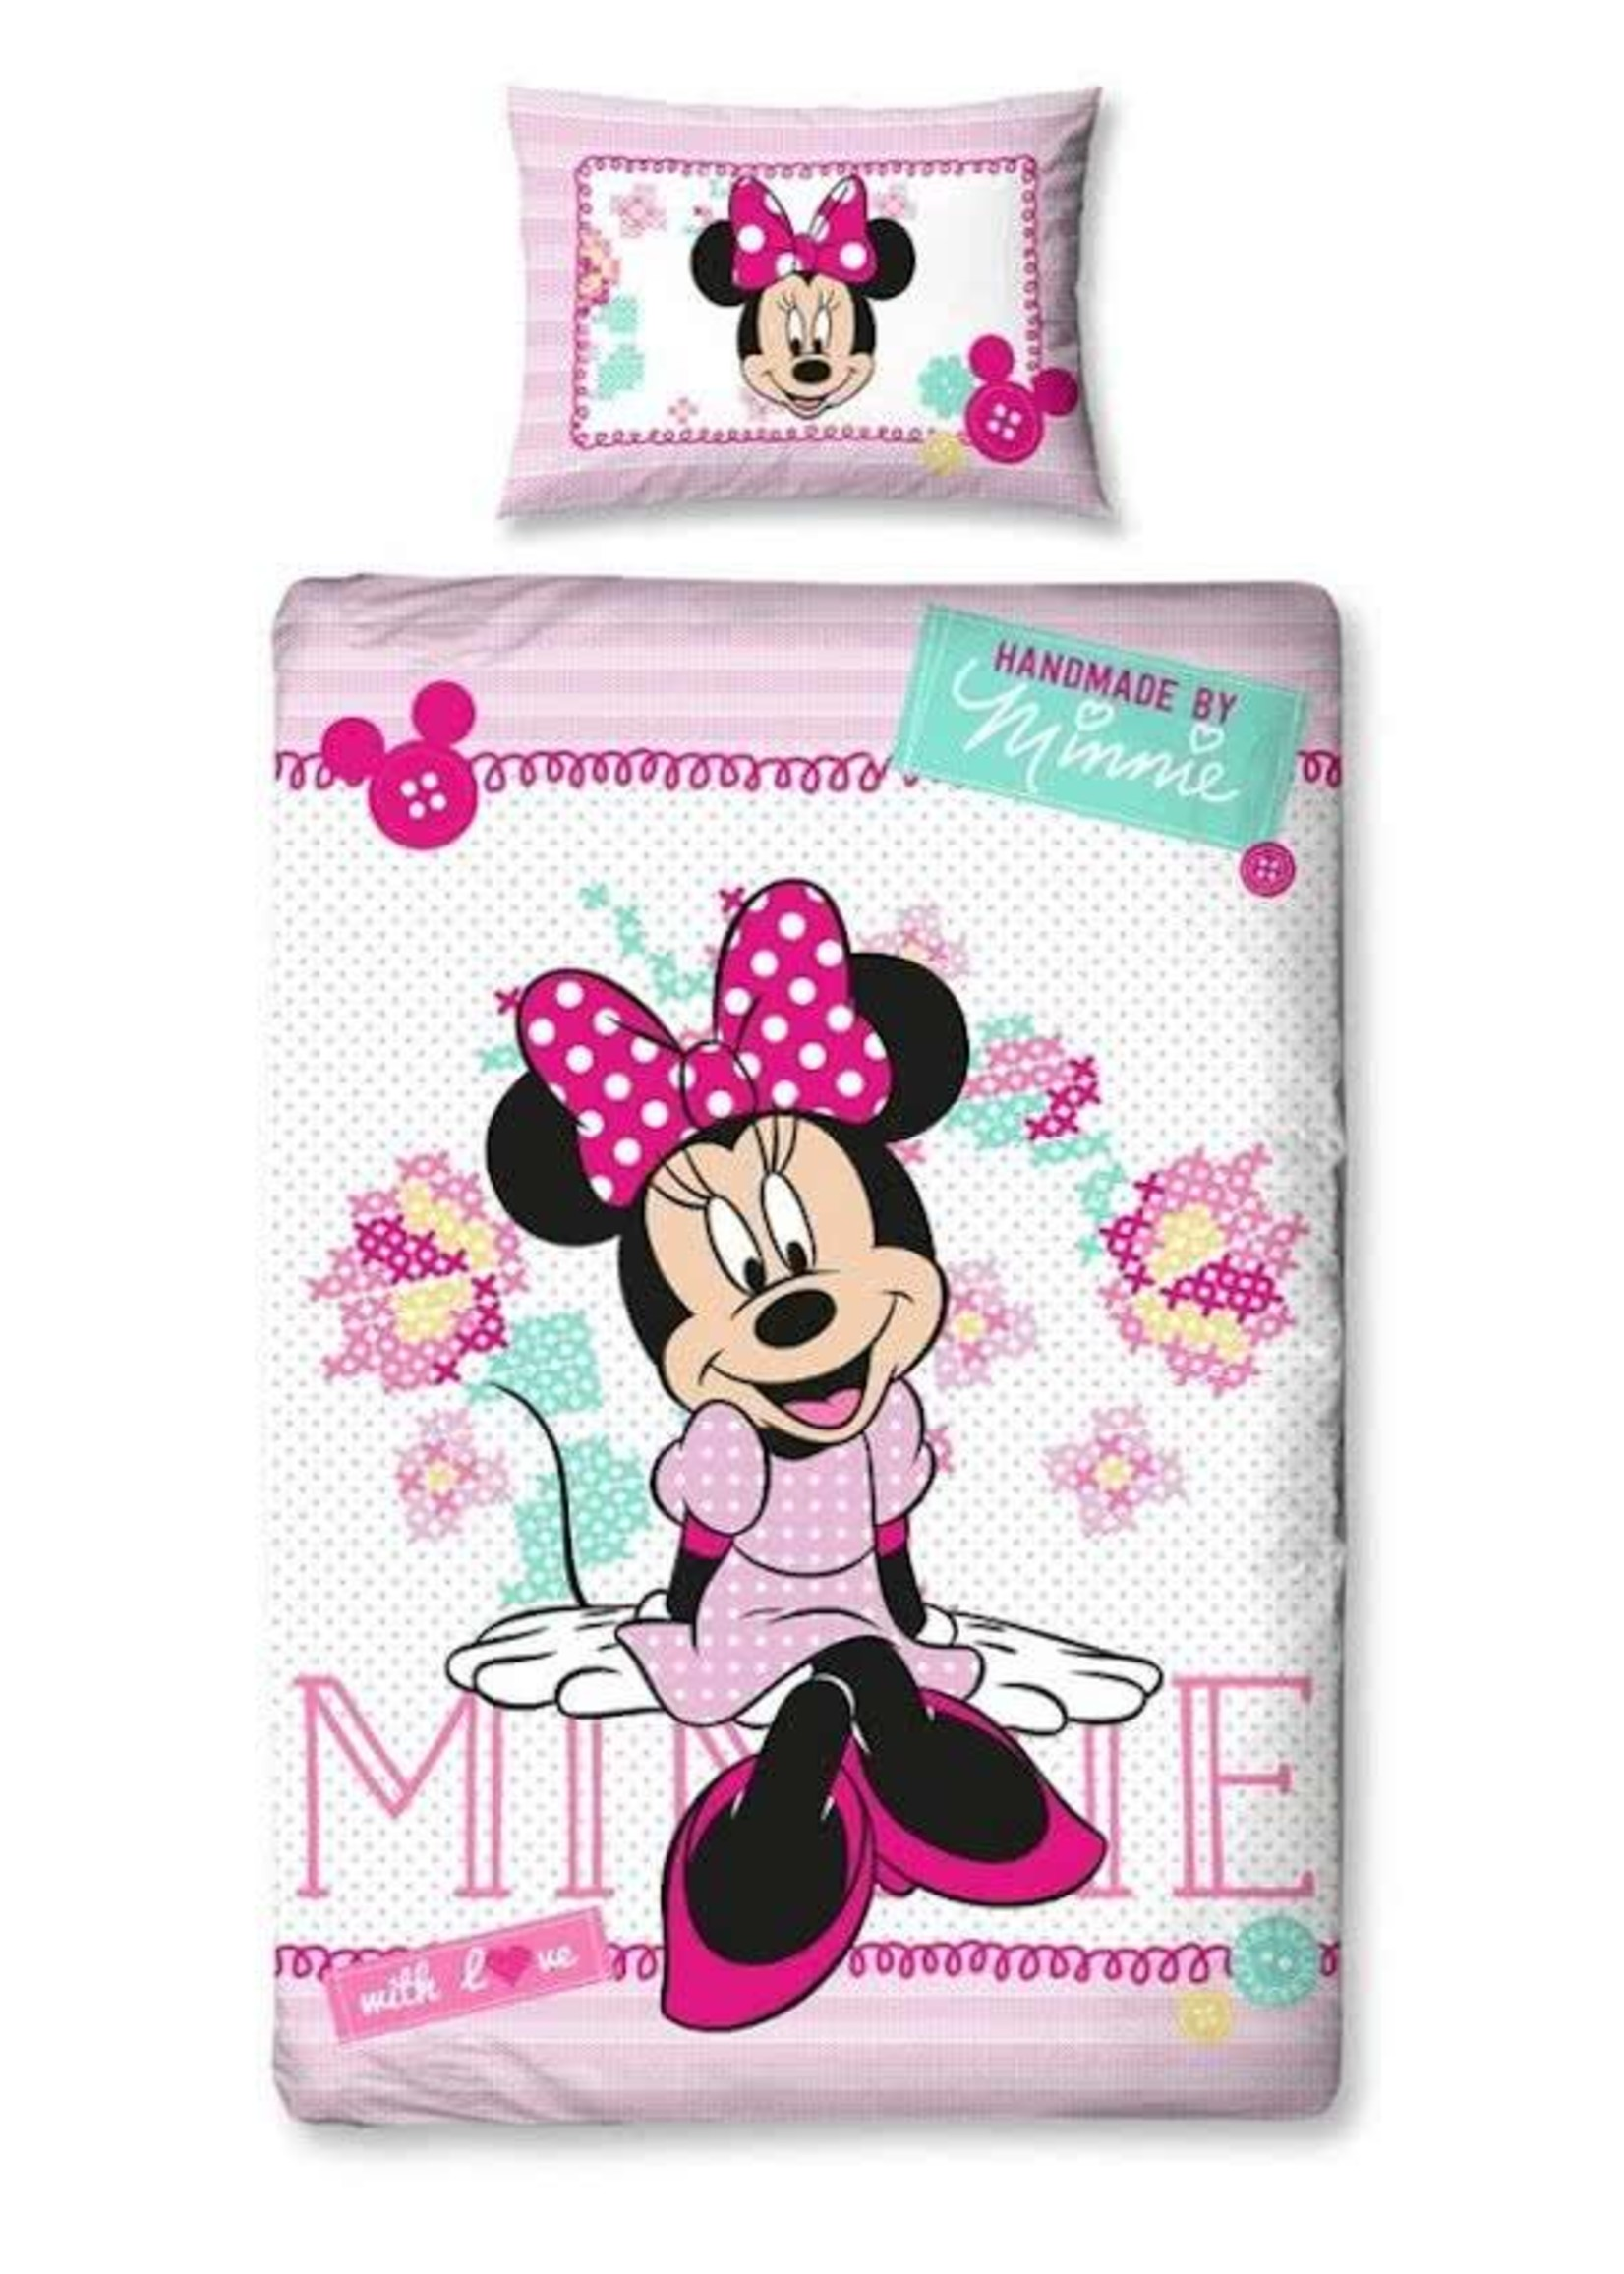 Disney Minnie Mouse Dekbedovertrek Handmade with Love